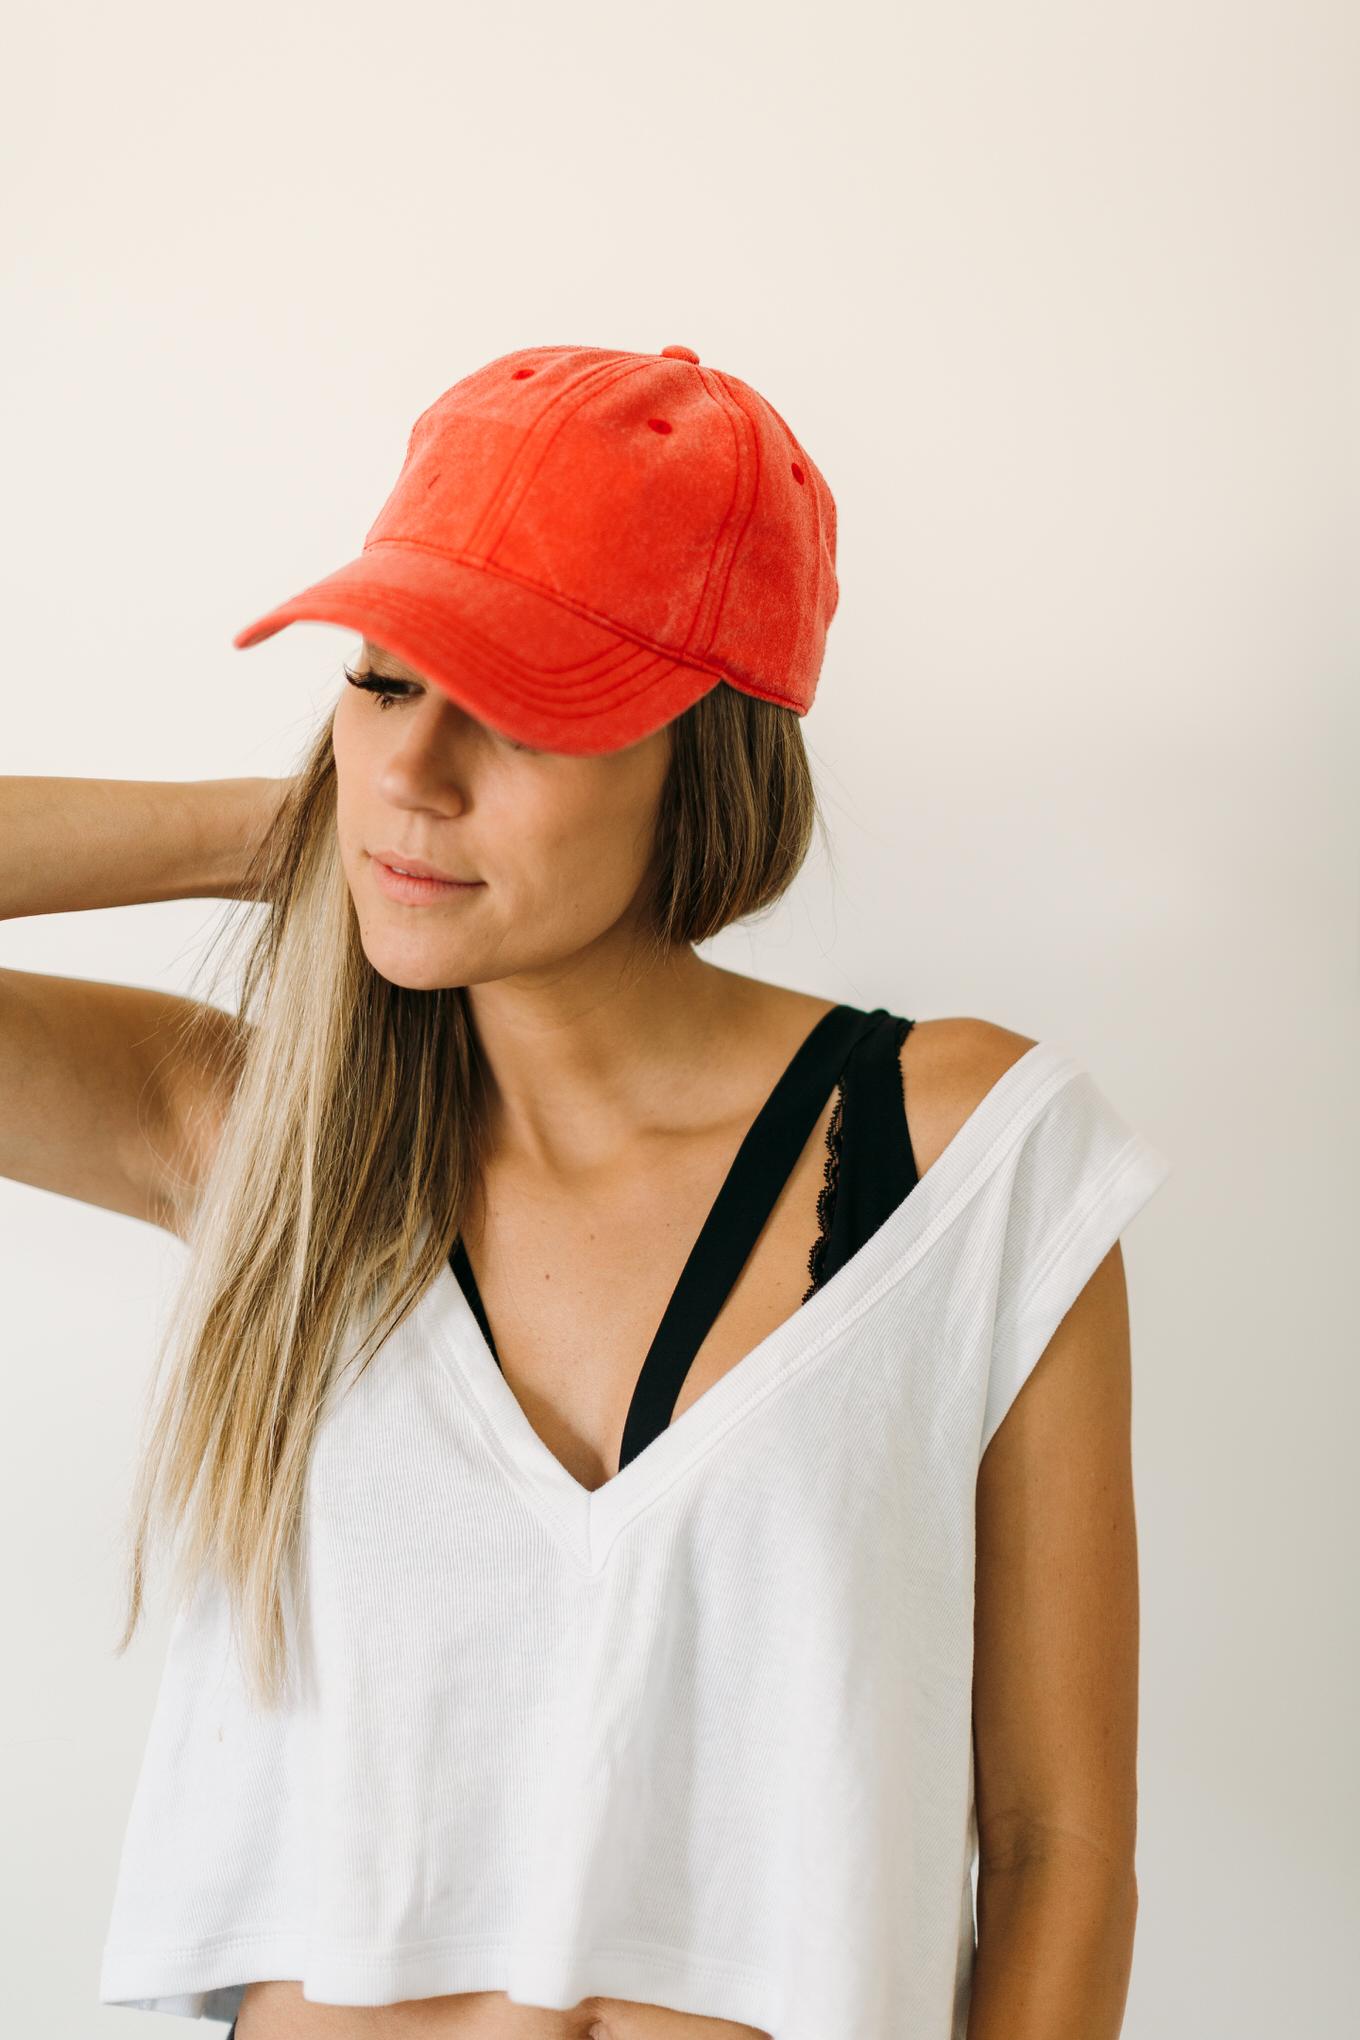 bralette styling tips